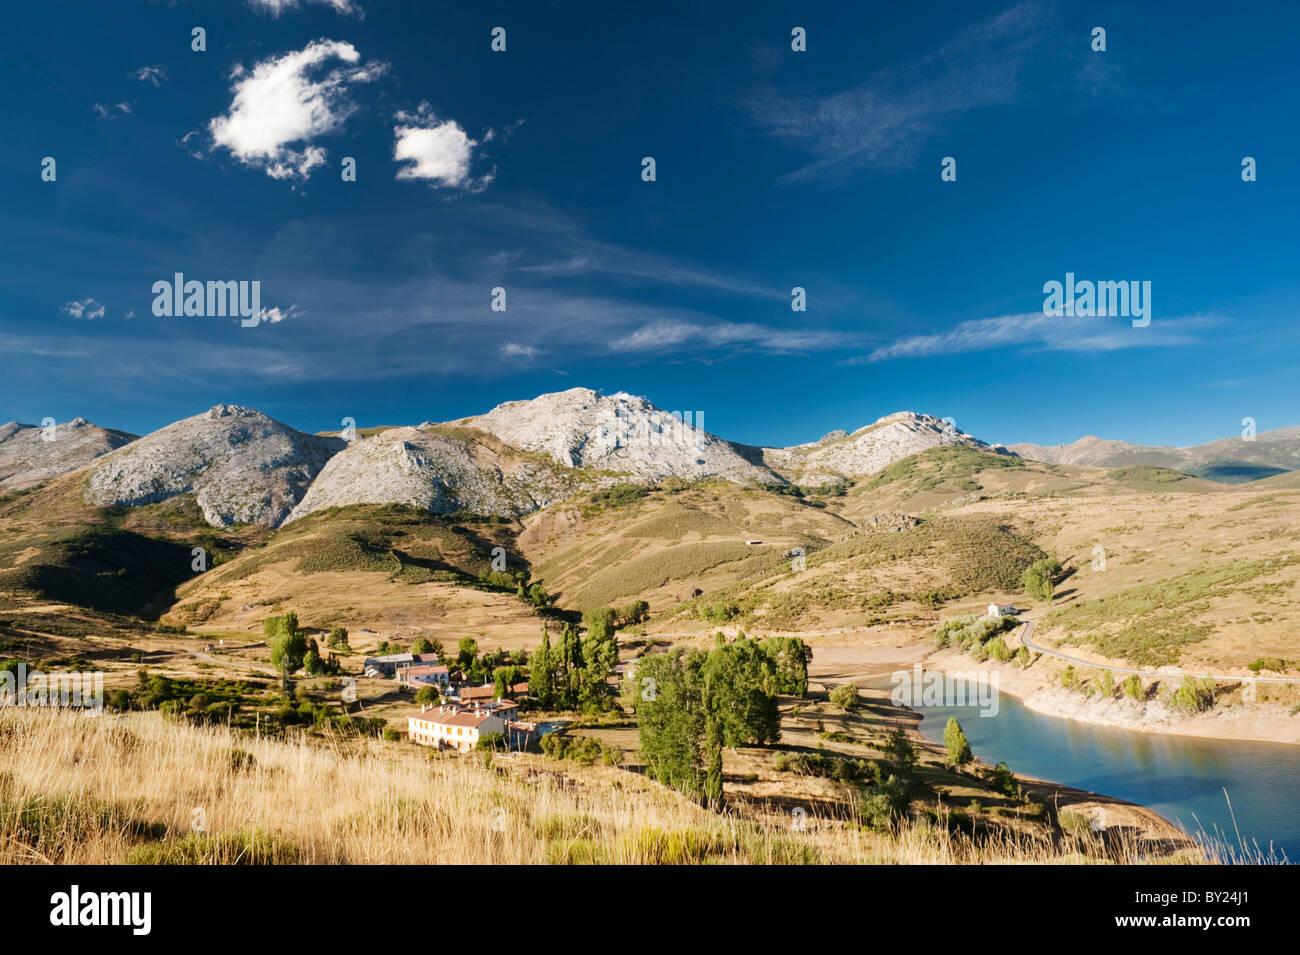 The Camporedondo Reservoir (Embalse de Camporedondo) and the village of Alba de los Cardaños, Palencia Province, - Stock Image